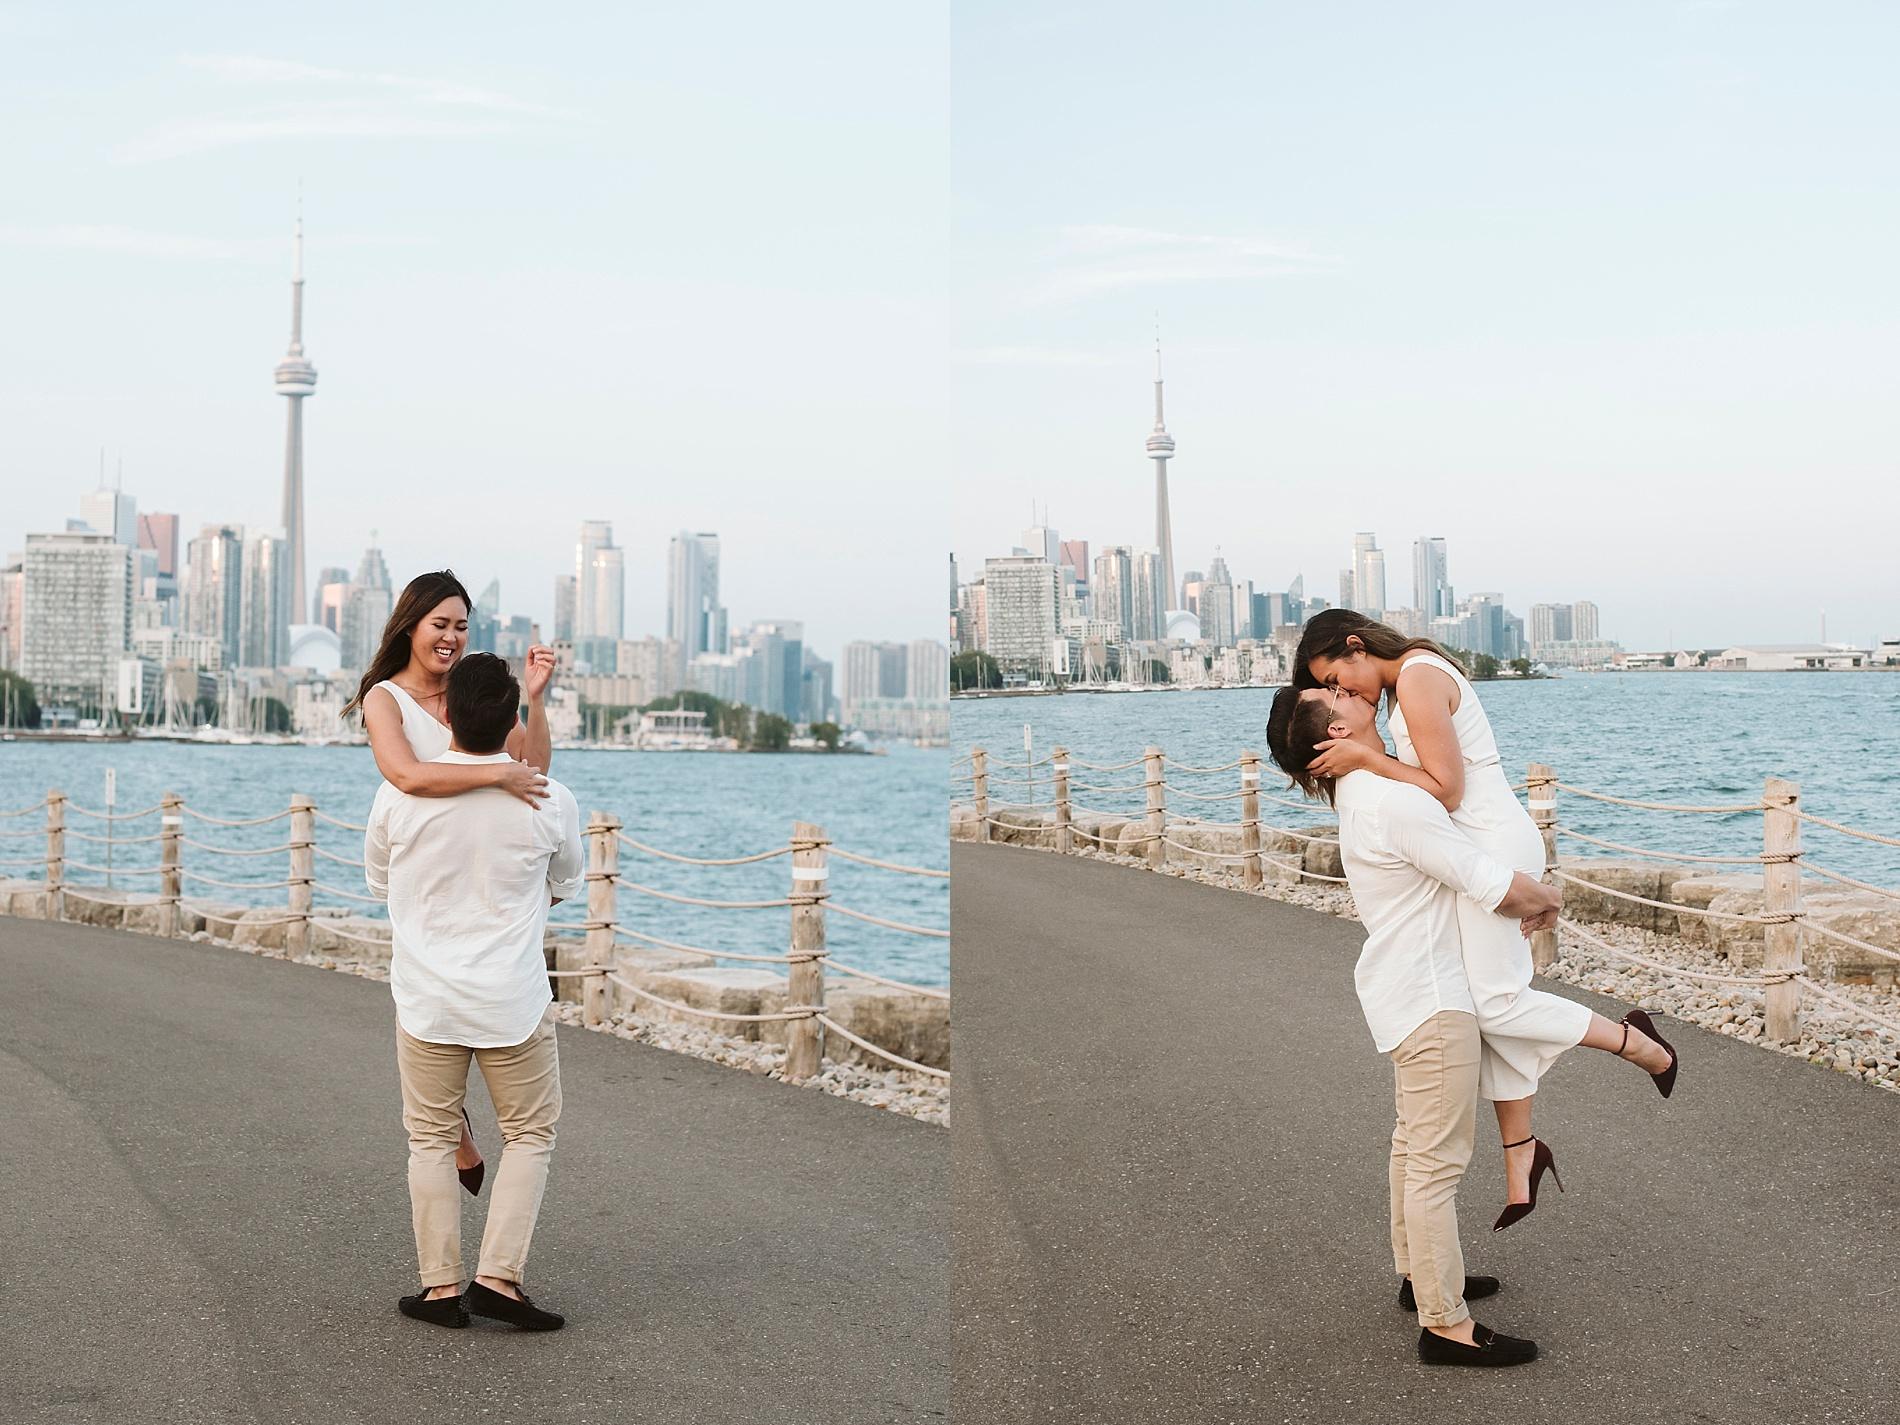 Toronto_Engagement_shoot_Ontario_Place_Lakeshore_0008.jpg